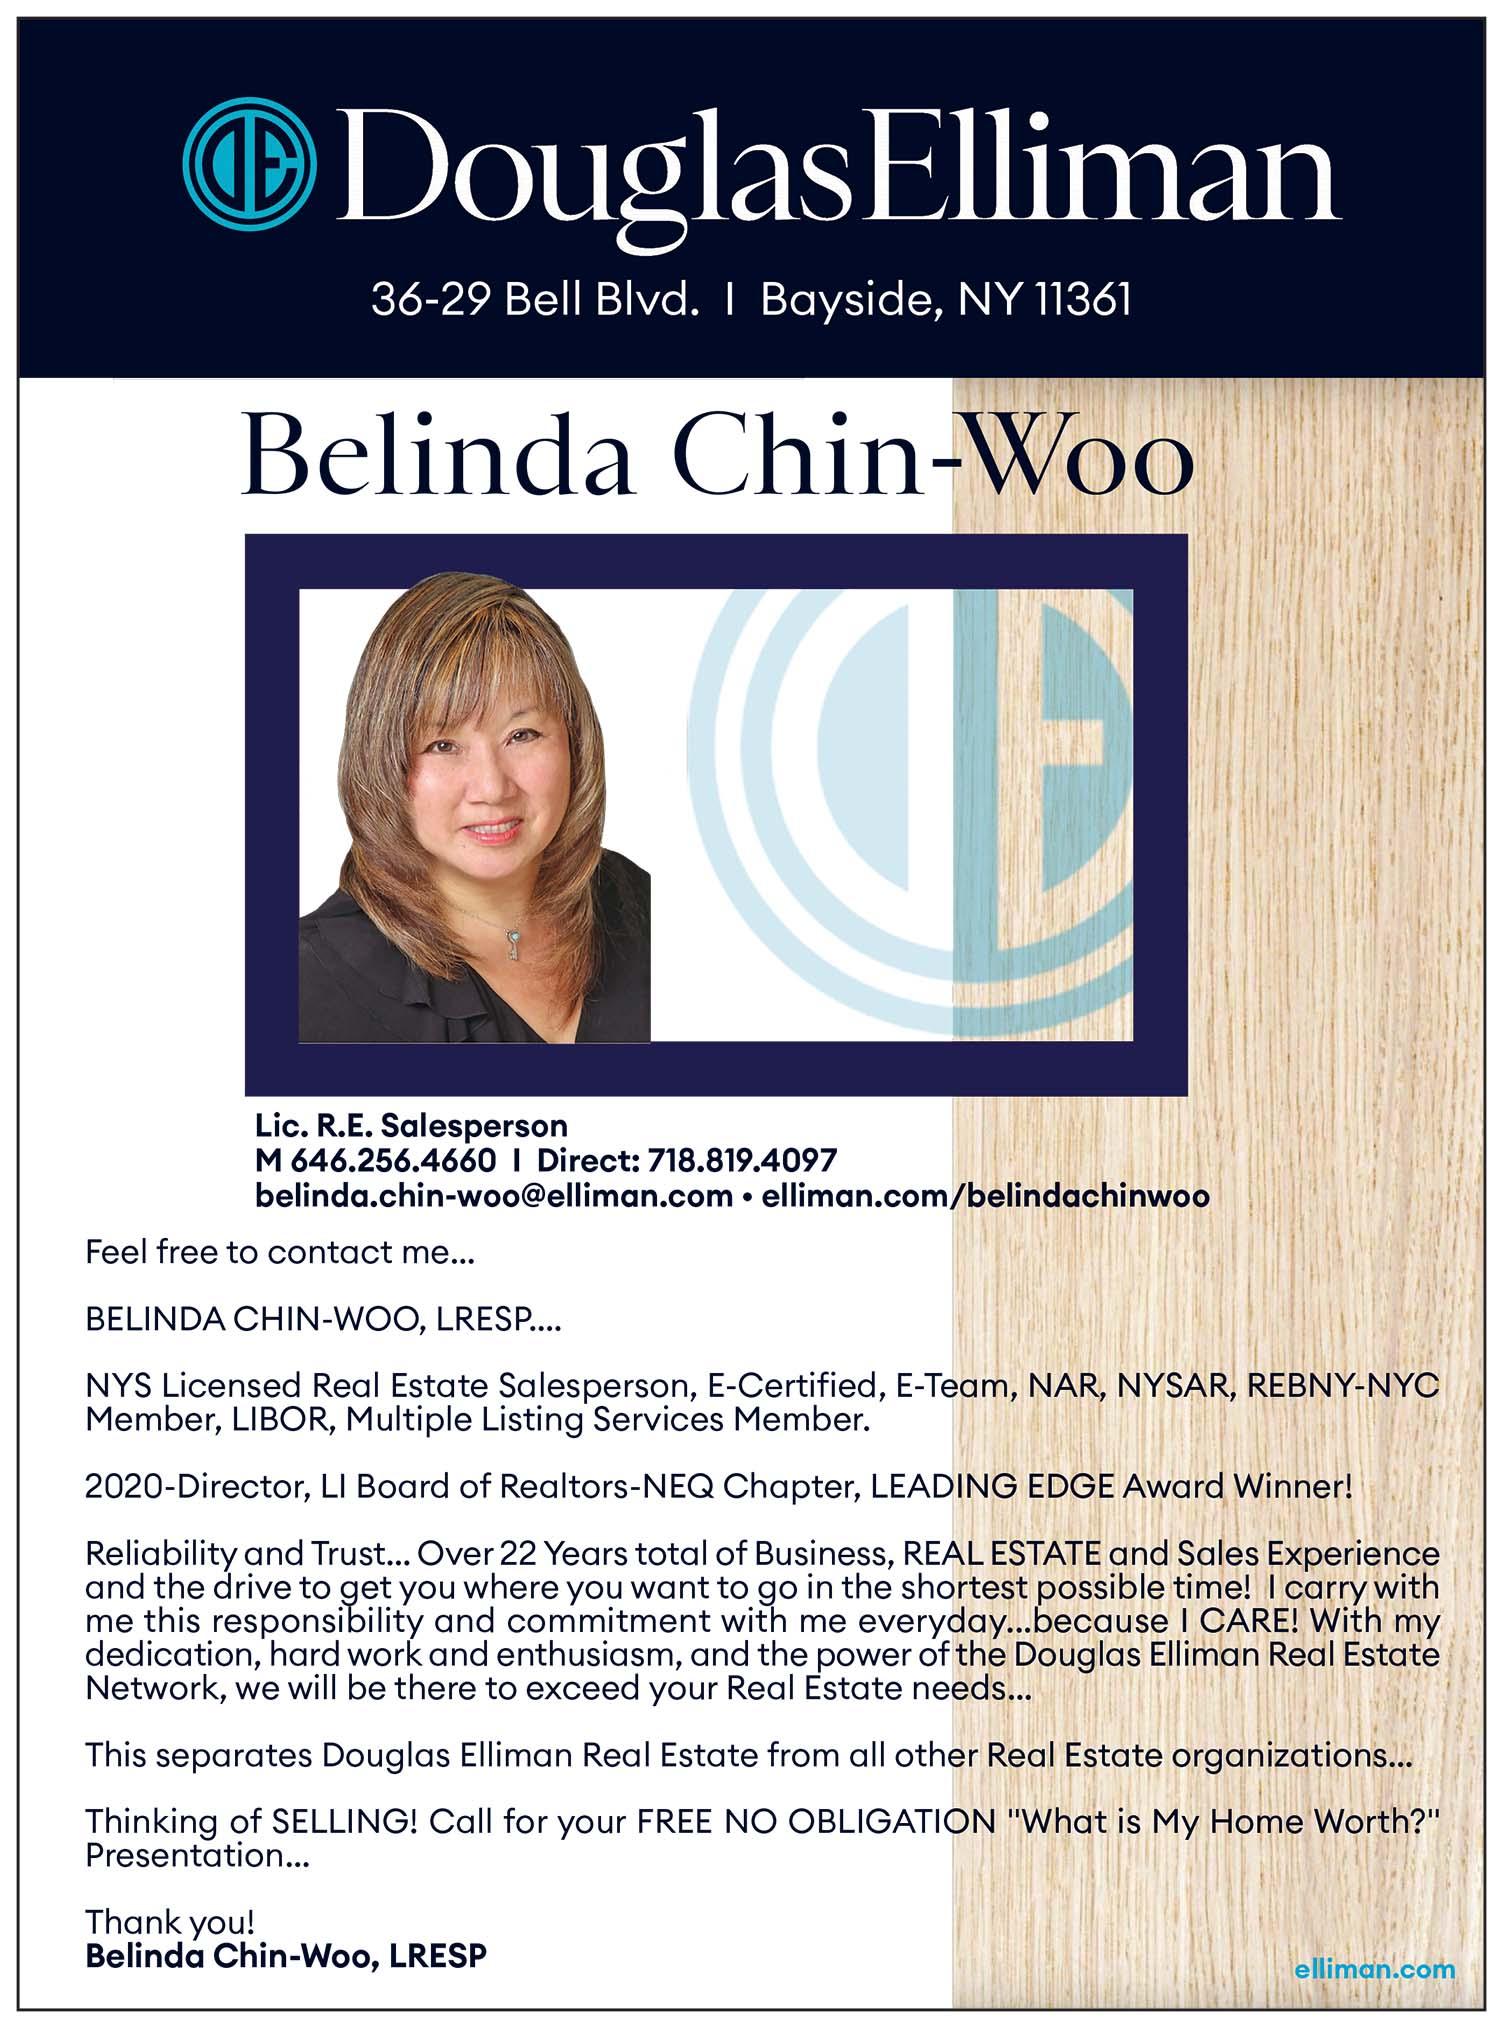 Belinda Chin-Woo Realtor Ad